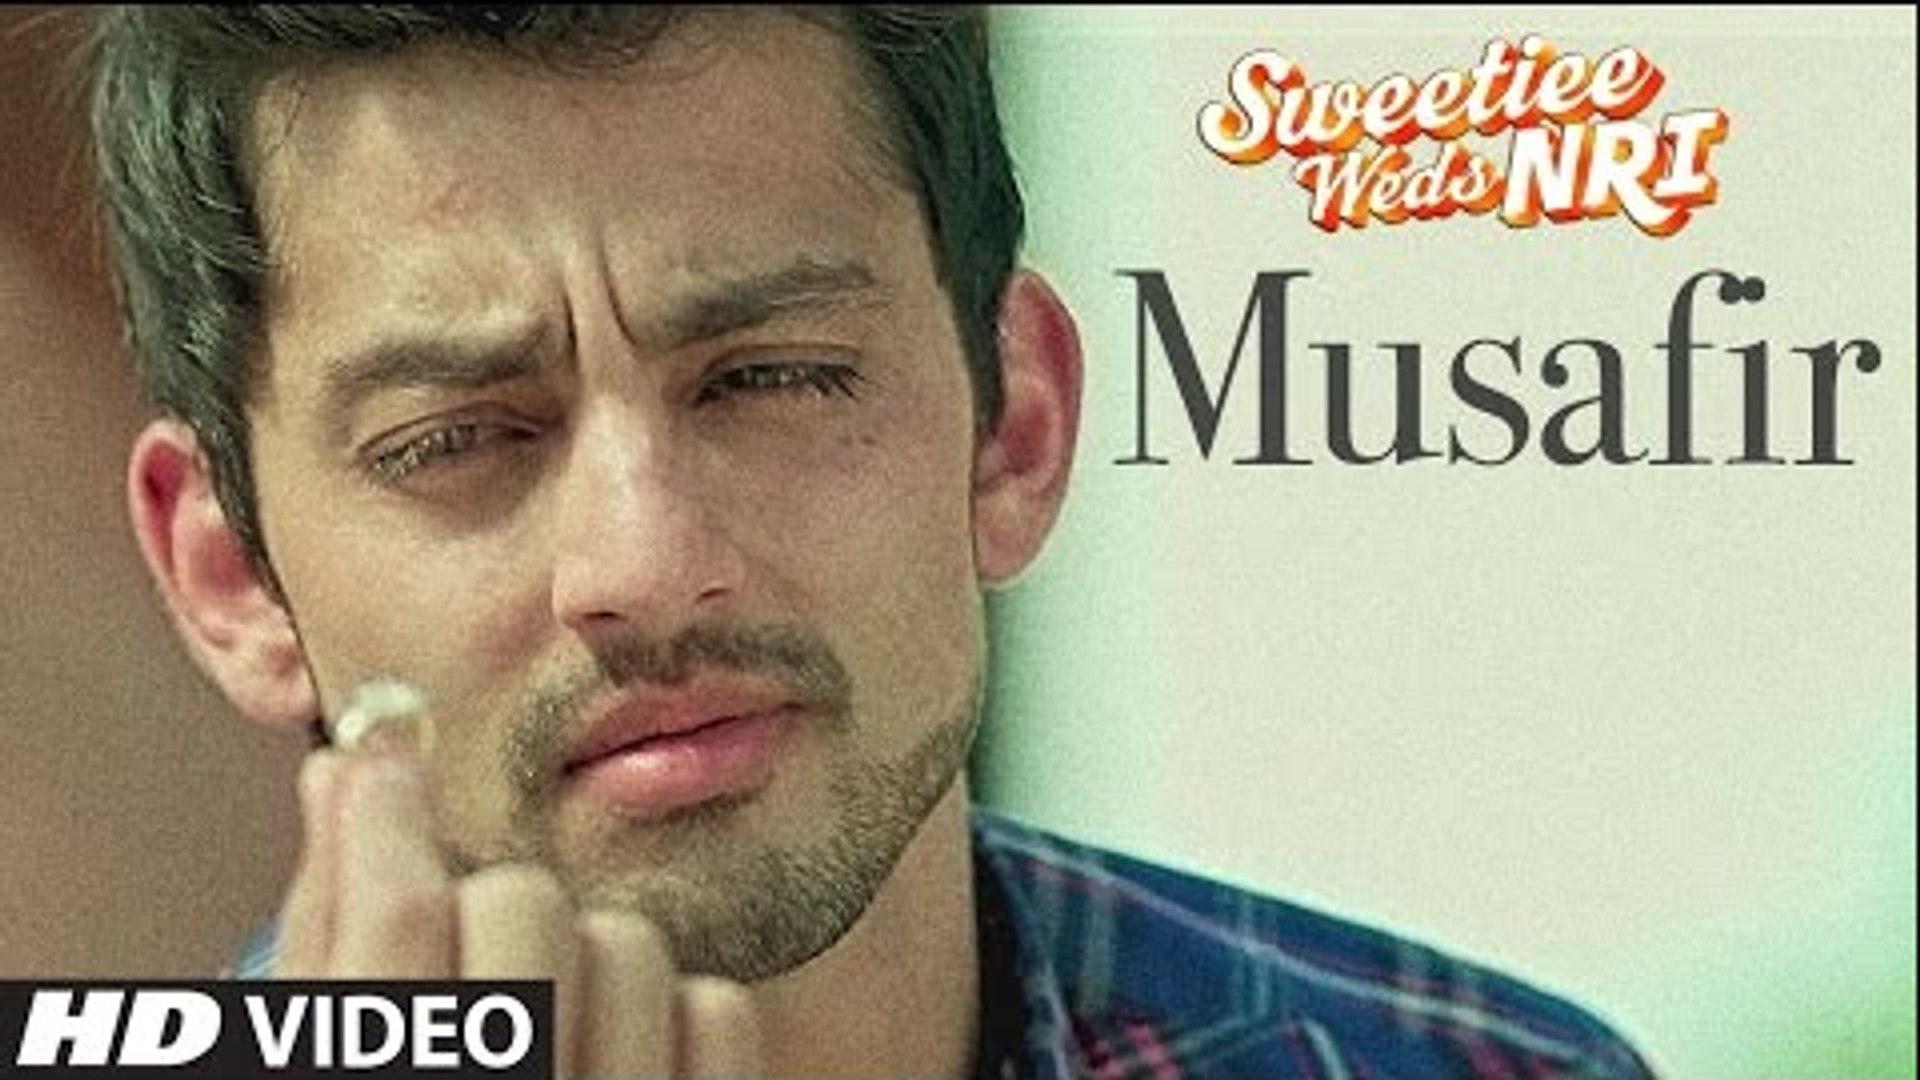 Atif Aslam- Musafir Song - Sweetiee Weds NRI - Himansh Kohli, Zoya Afroz - Palak  & Palash Muchh